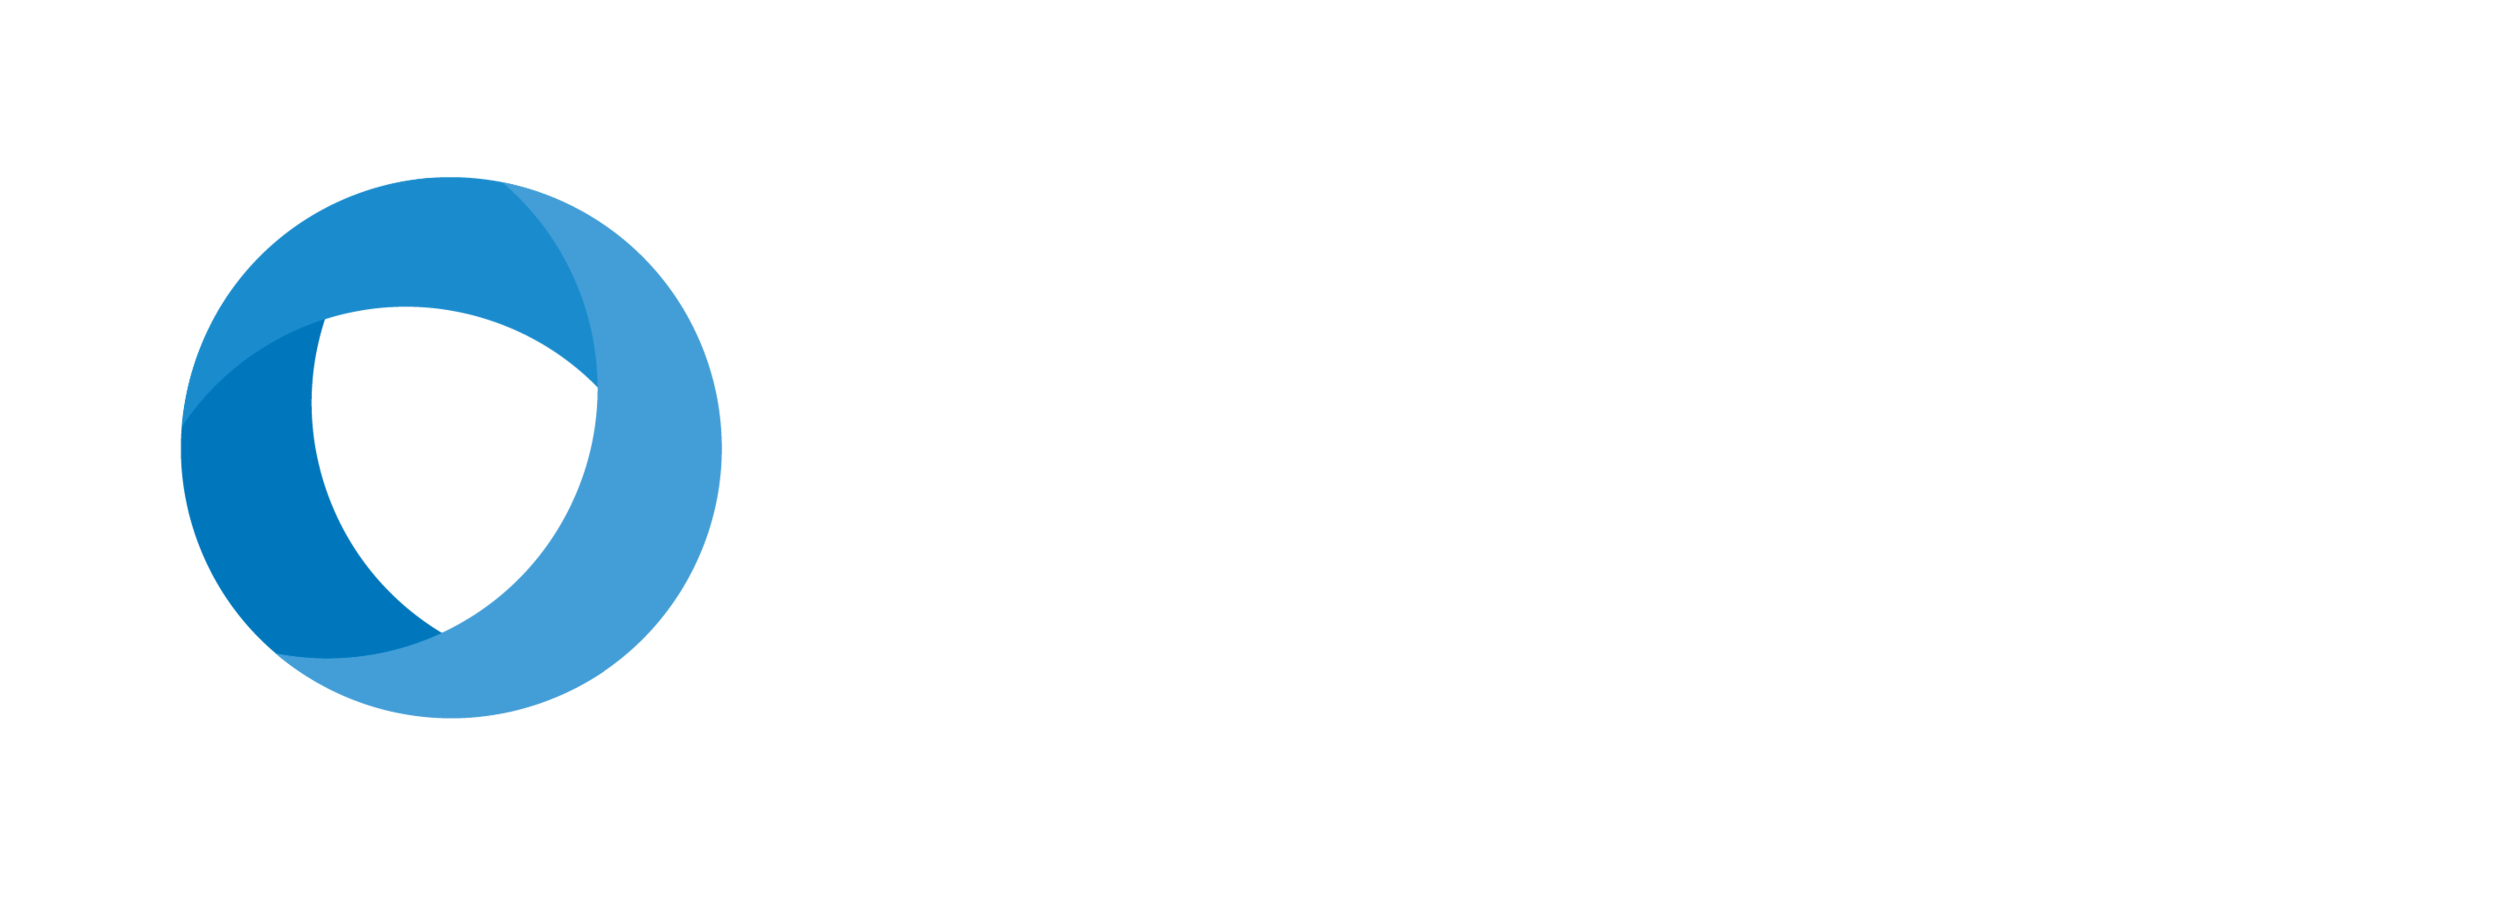 CMS_logo_july2017_white-01.png